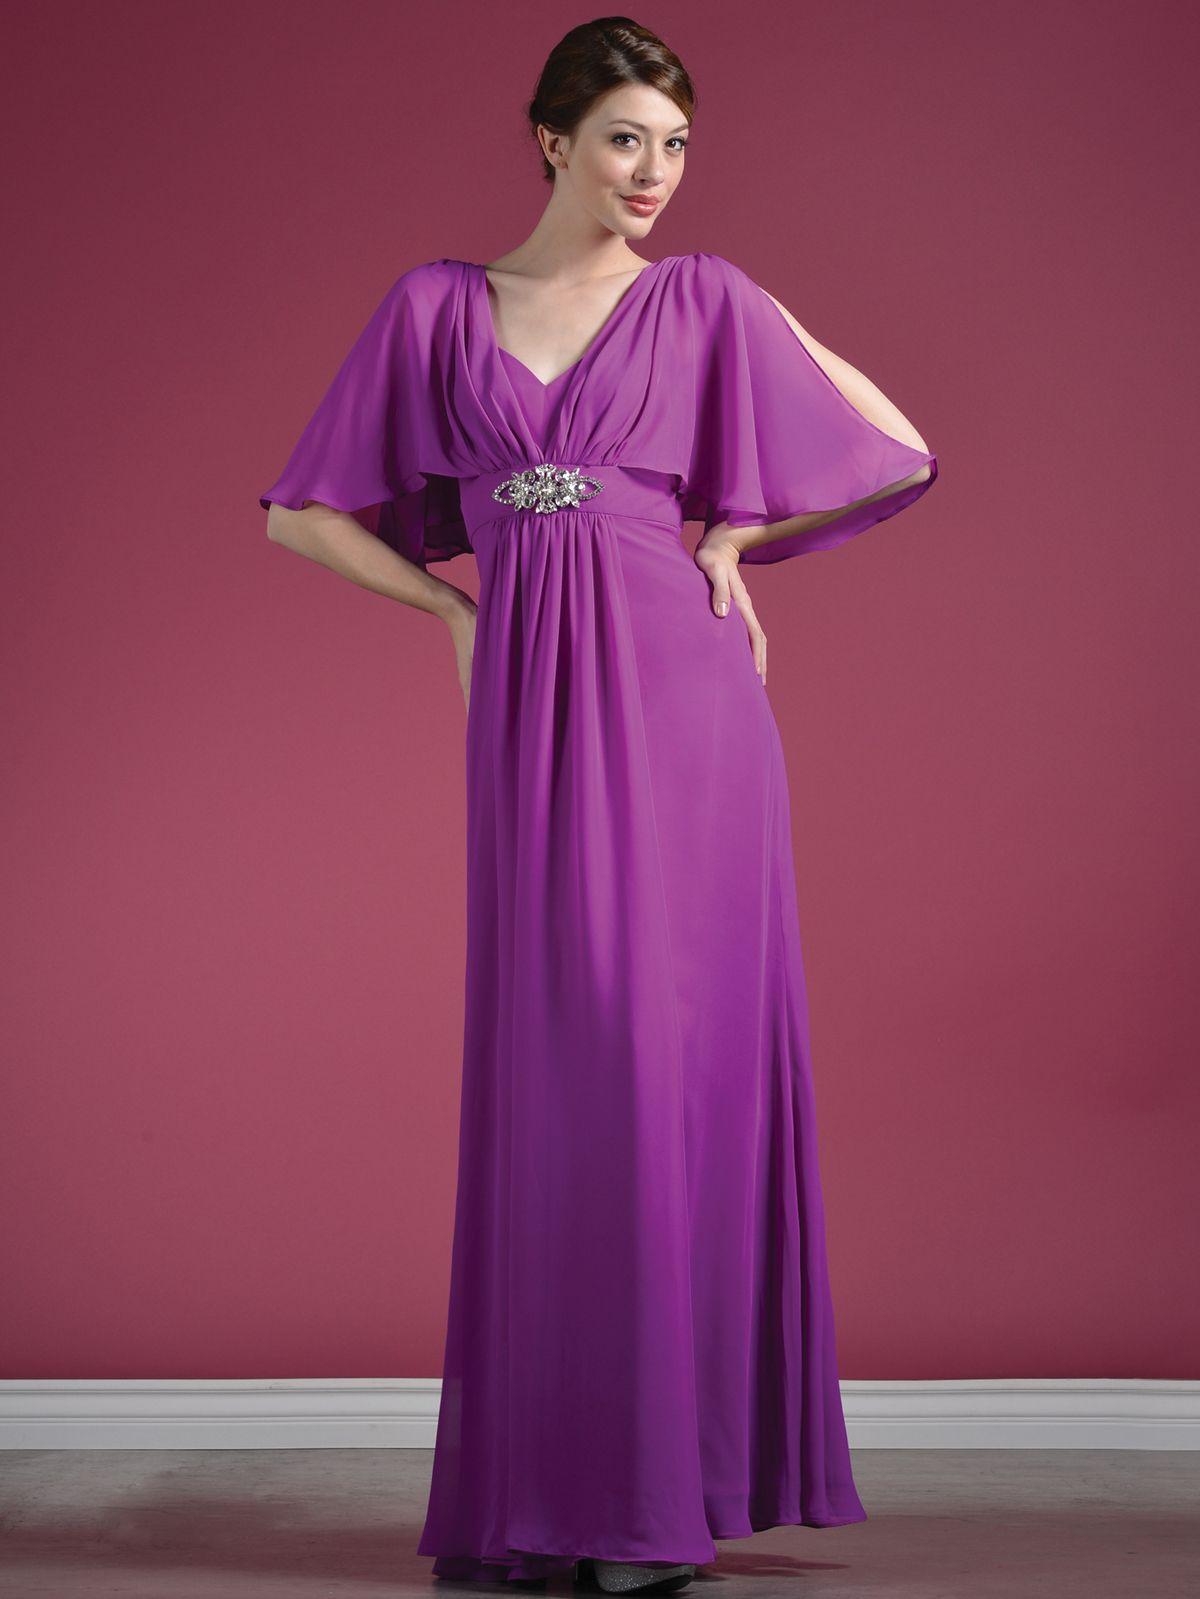 plus size purple bridesmaid dresses - Google Search | bridesmaids ...